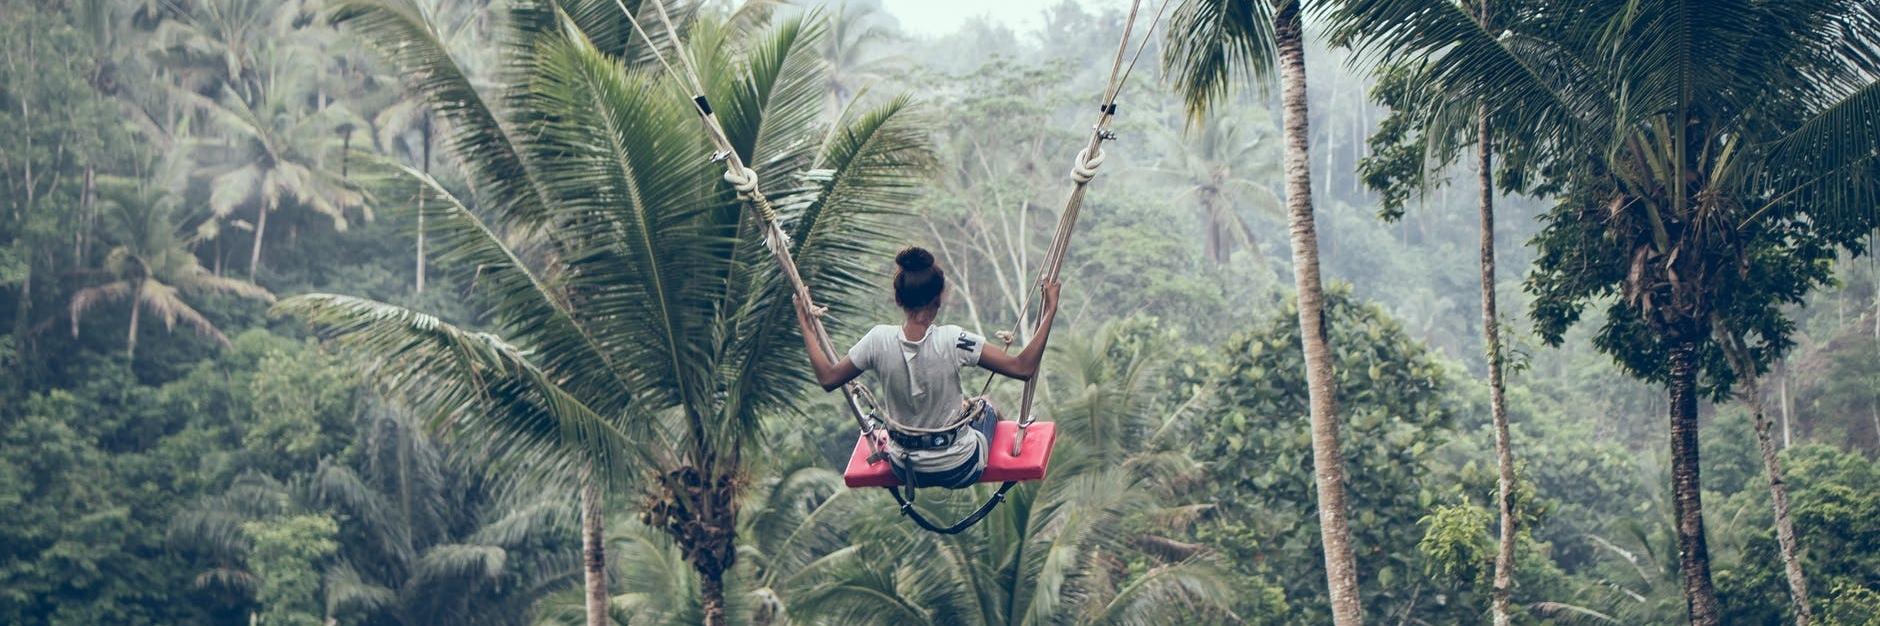 https://gody.vn/blog/thienthunguyen/post/du-lich-bali-nhung-diem-den-trong-mo-ban-nhat-dinh-phai-biet-2009